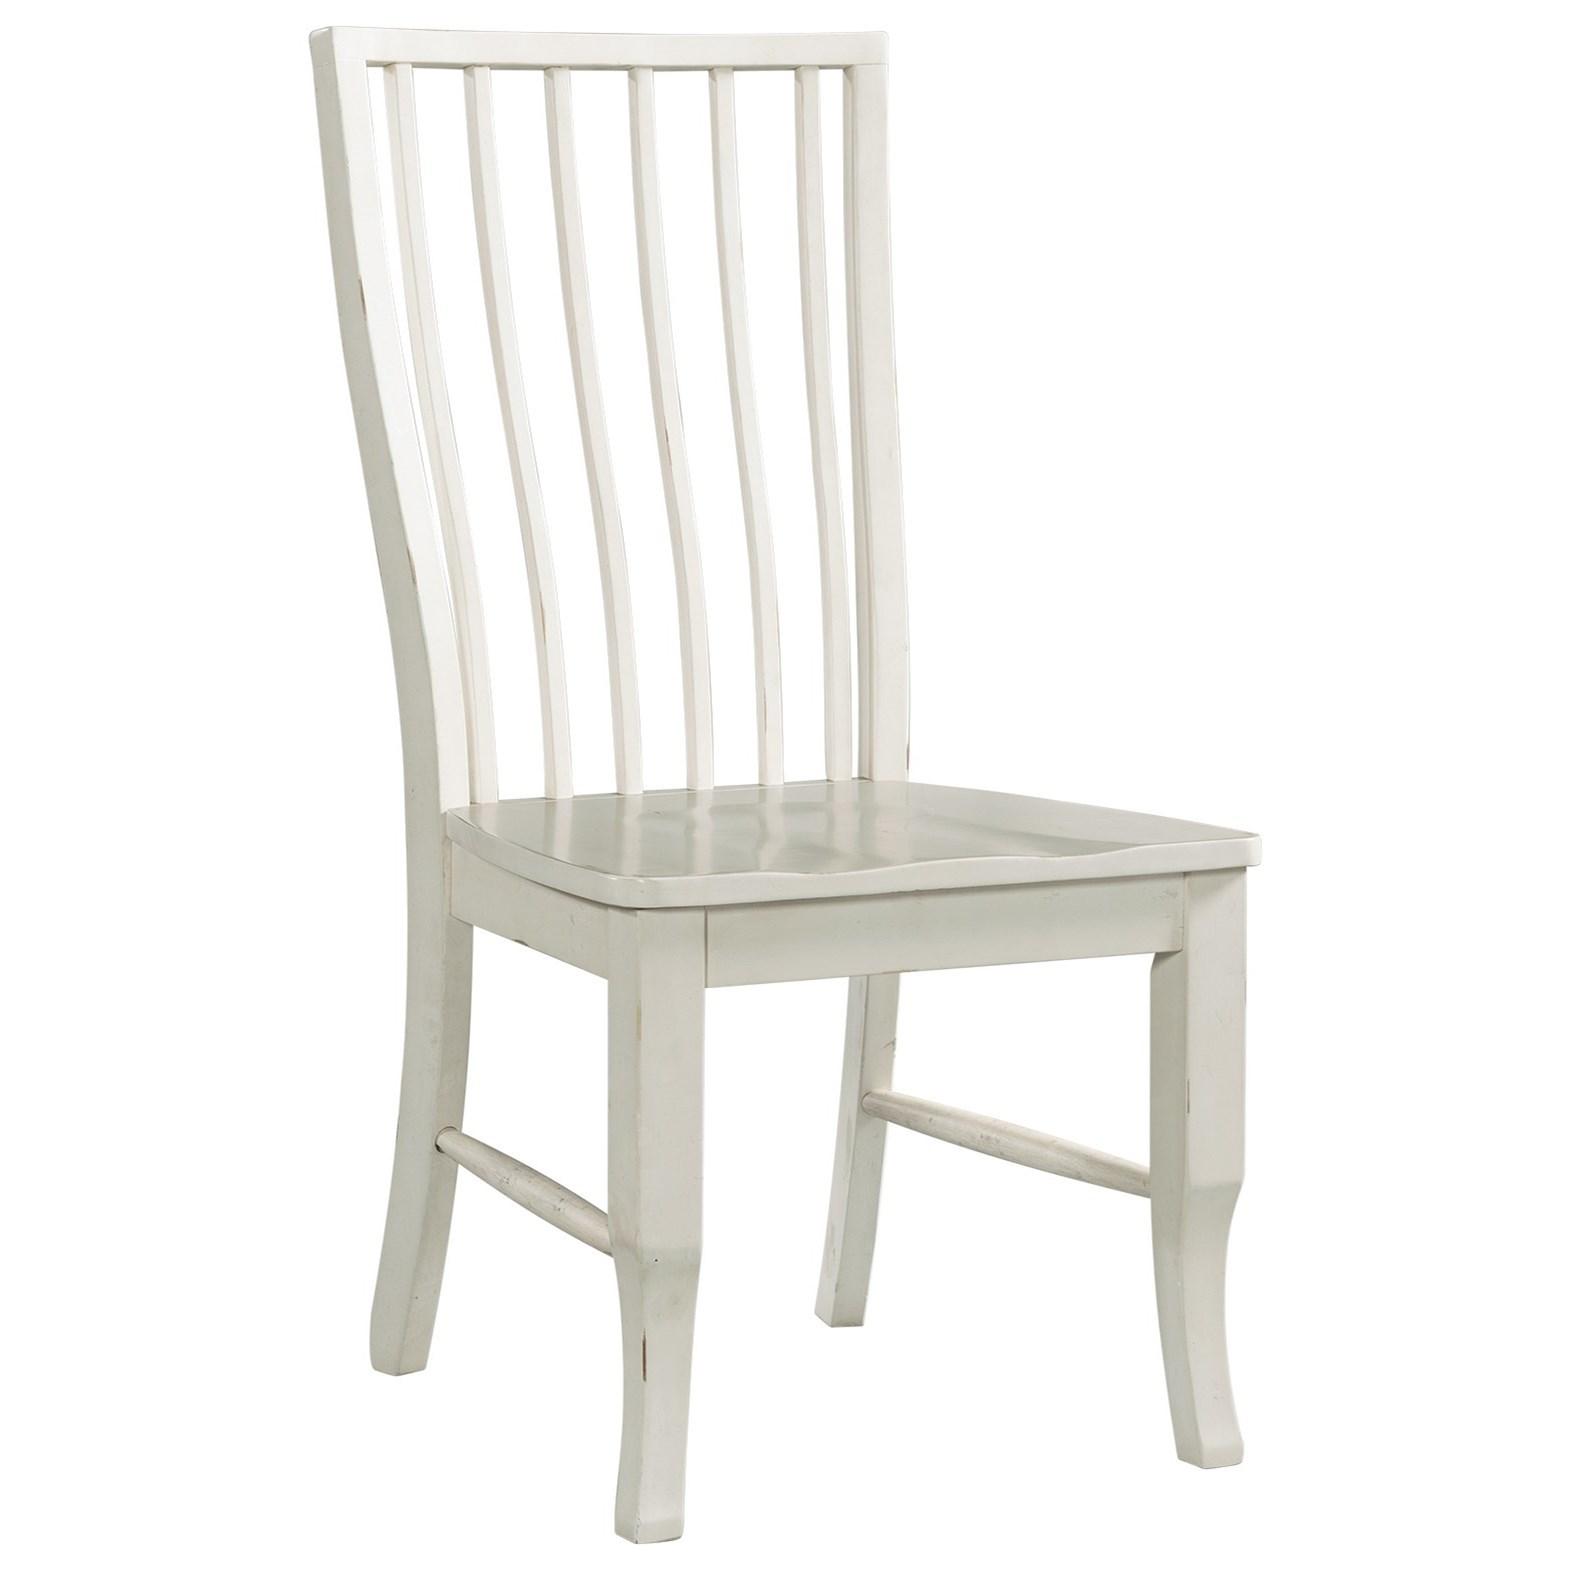 Bristol Bay Slat Back Side Chair by Elements International at Zak's Warehouse Clearance Center